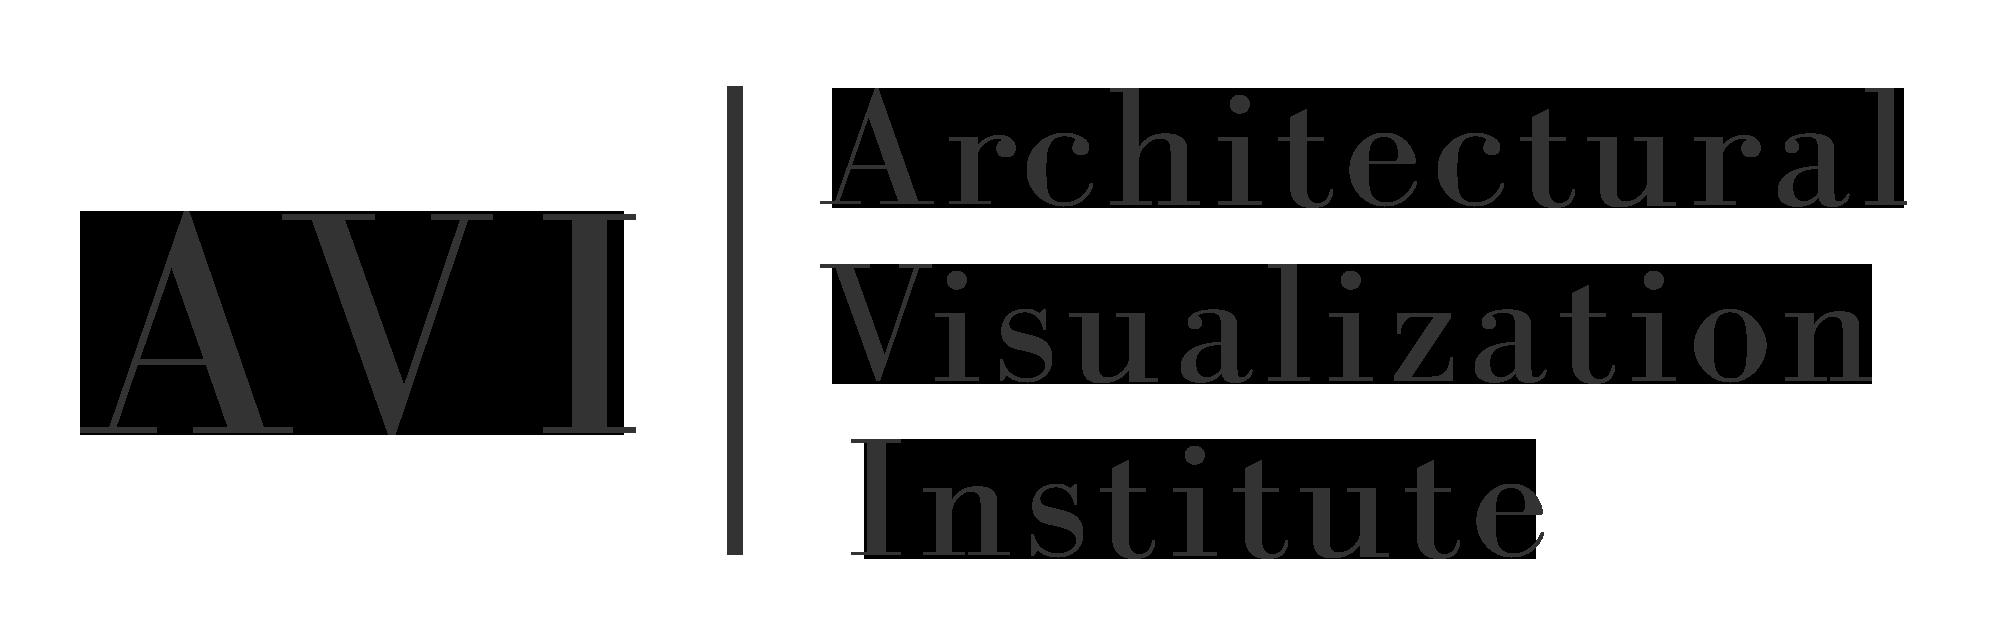 The Architectural Visualization Institute